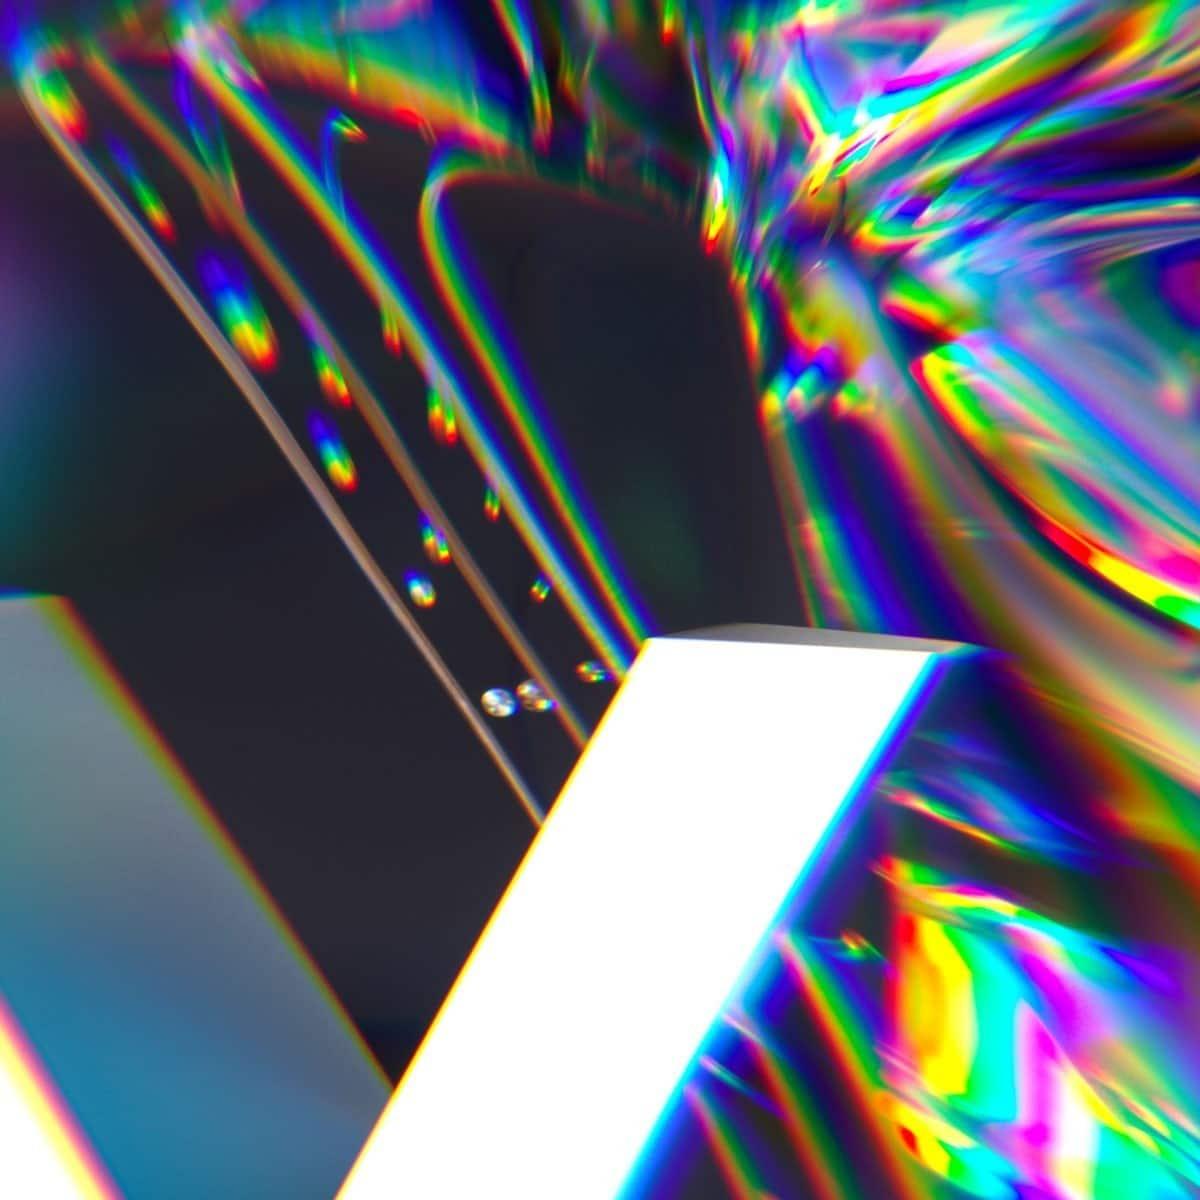 2021 psychedelic studies on track to beat 2020 peak